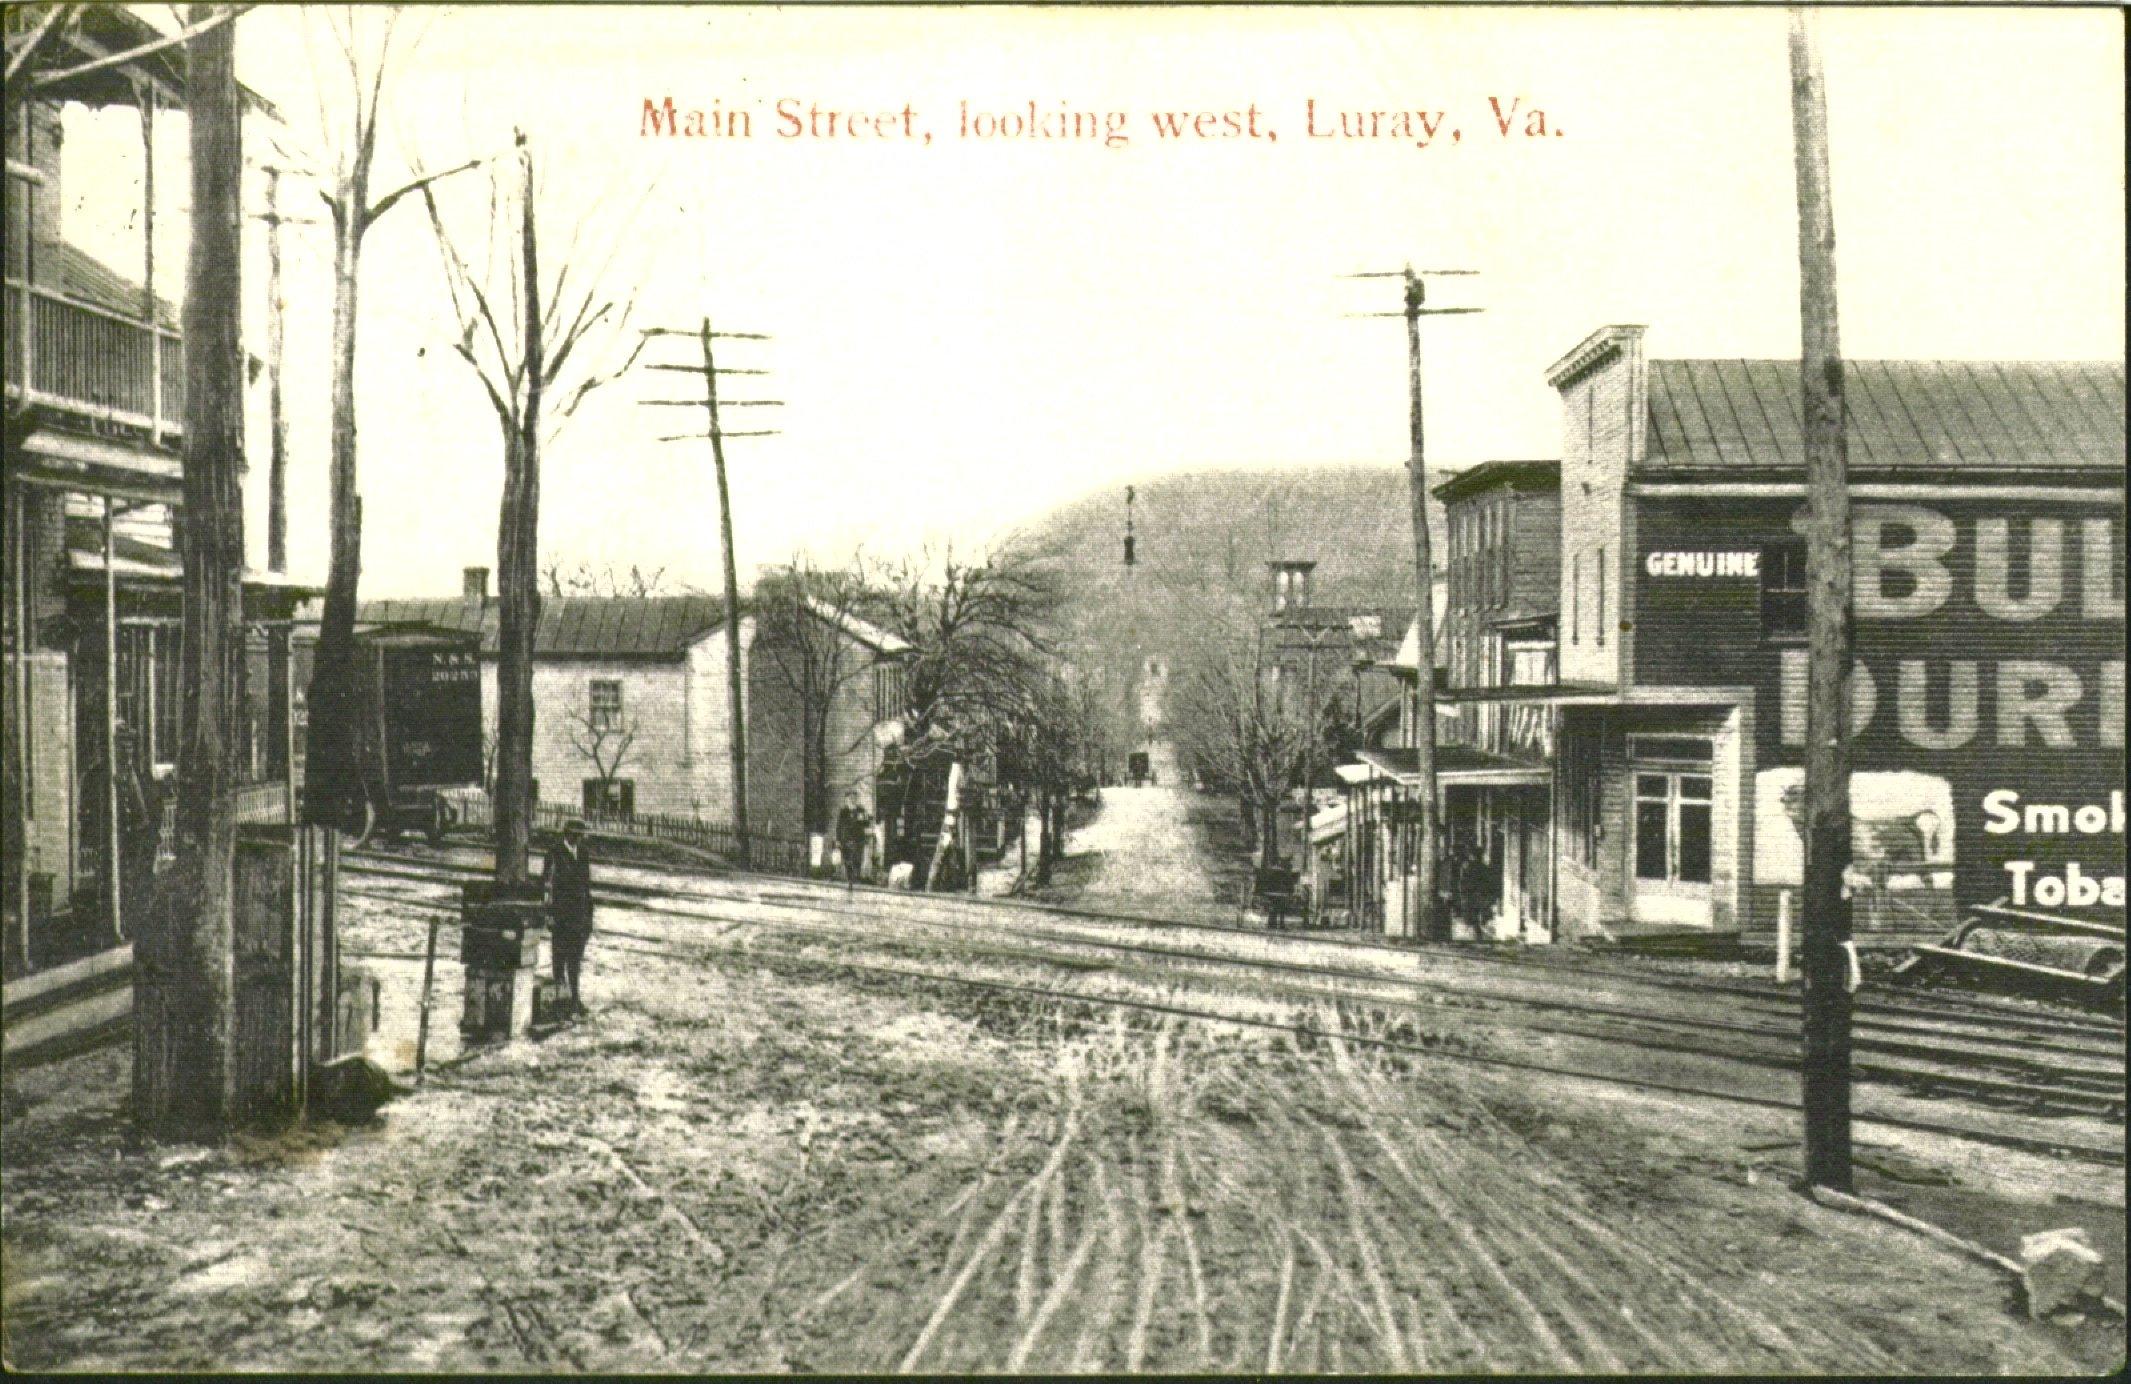 Main Street, looking west, Luray, VA, 1910. Photo by Bill McChesney.